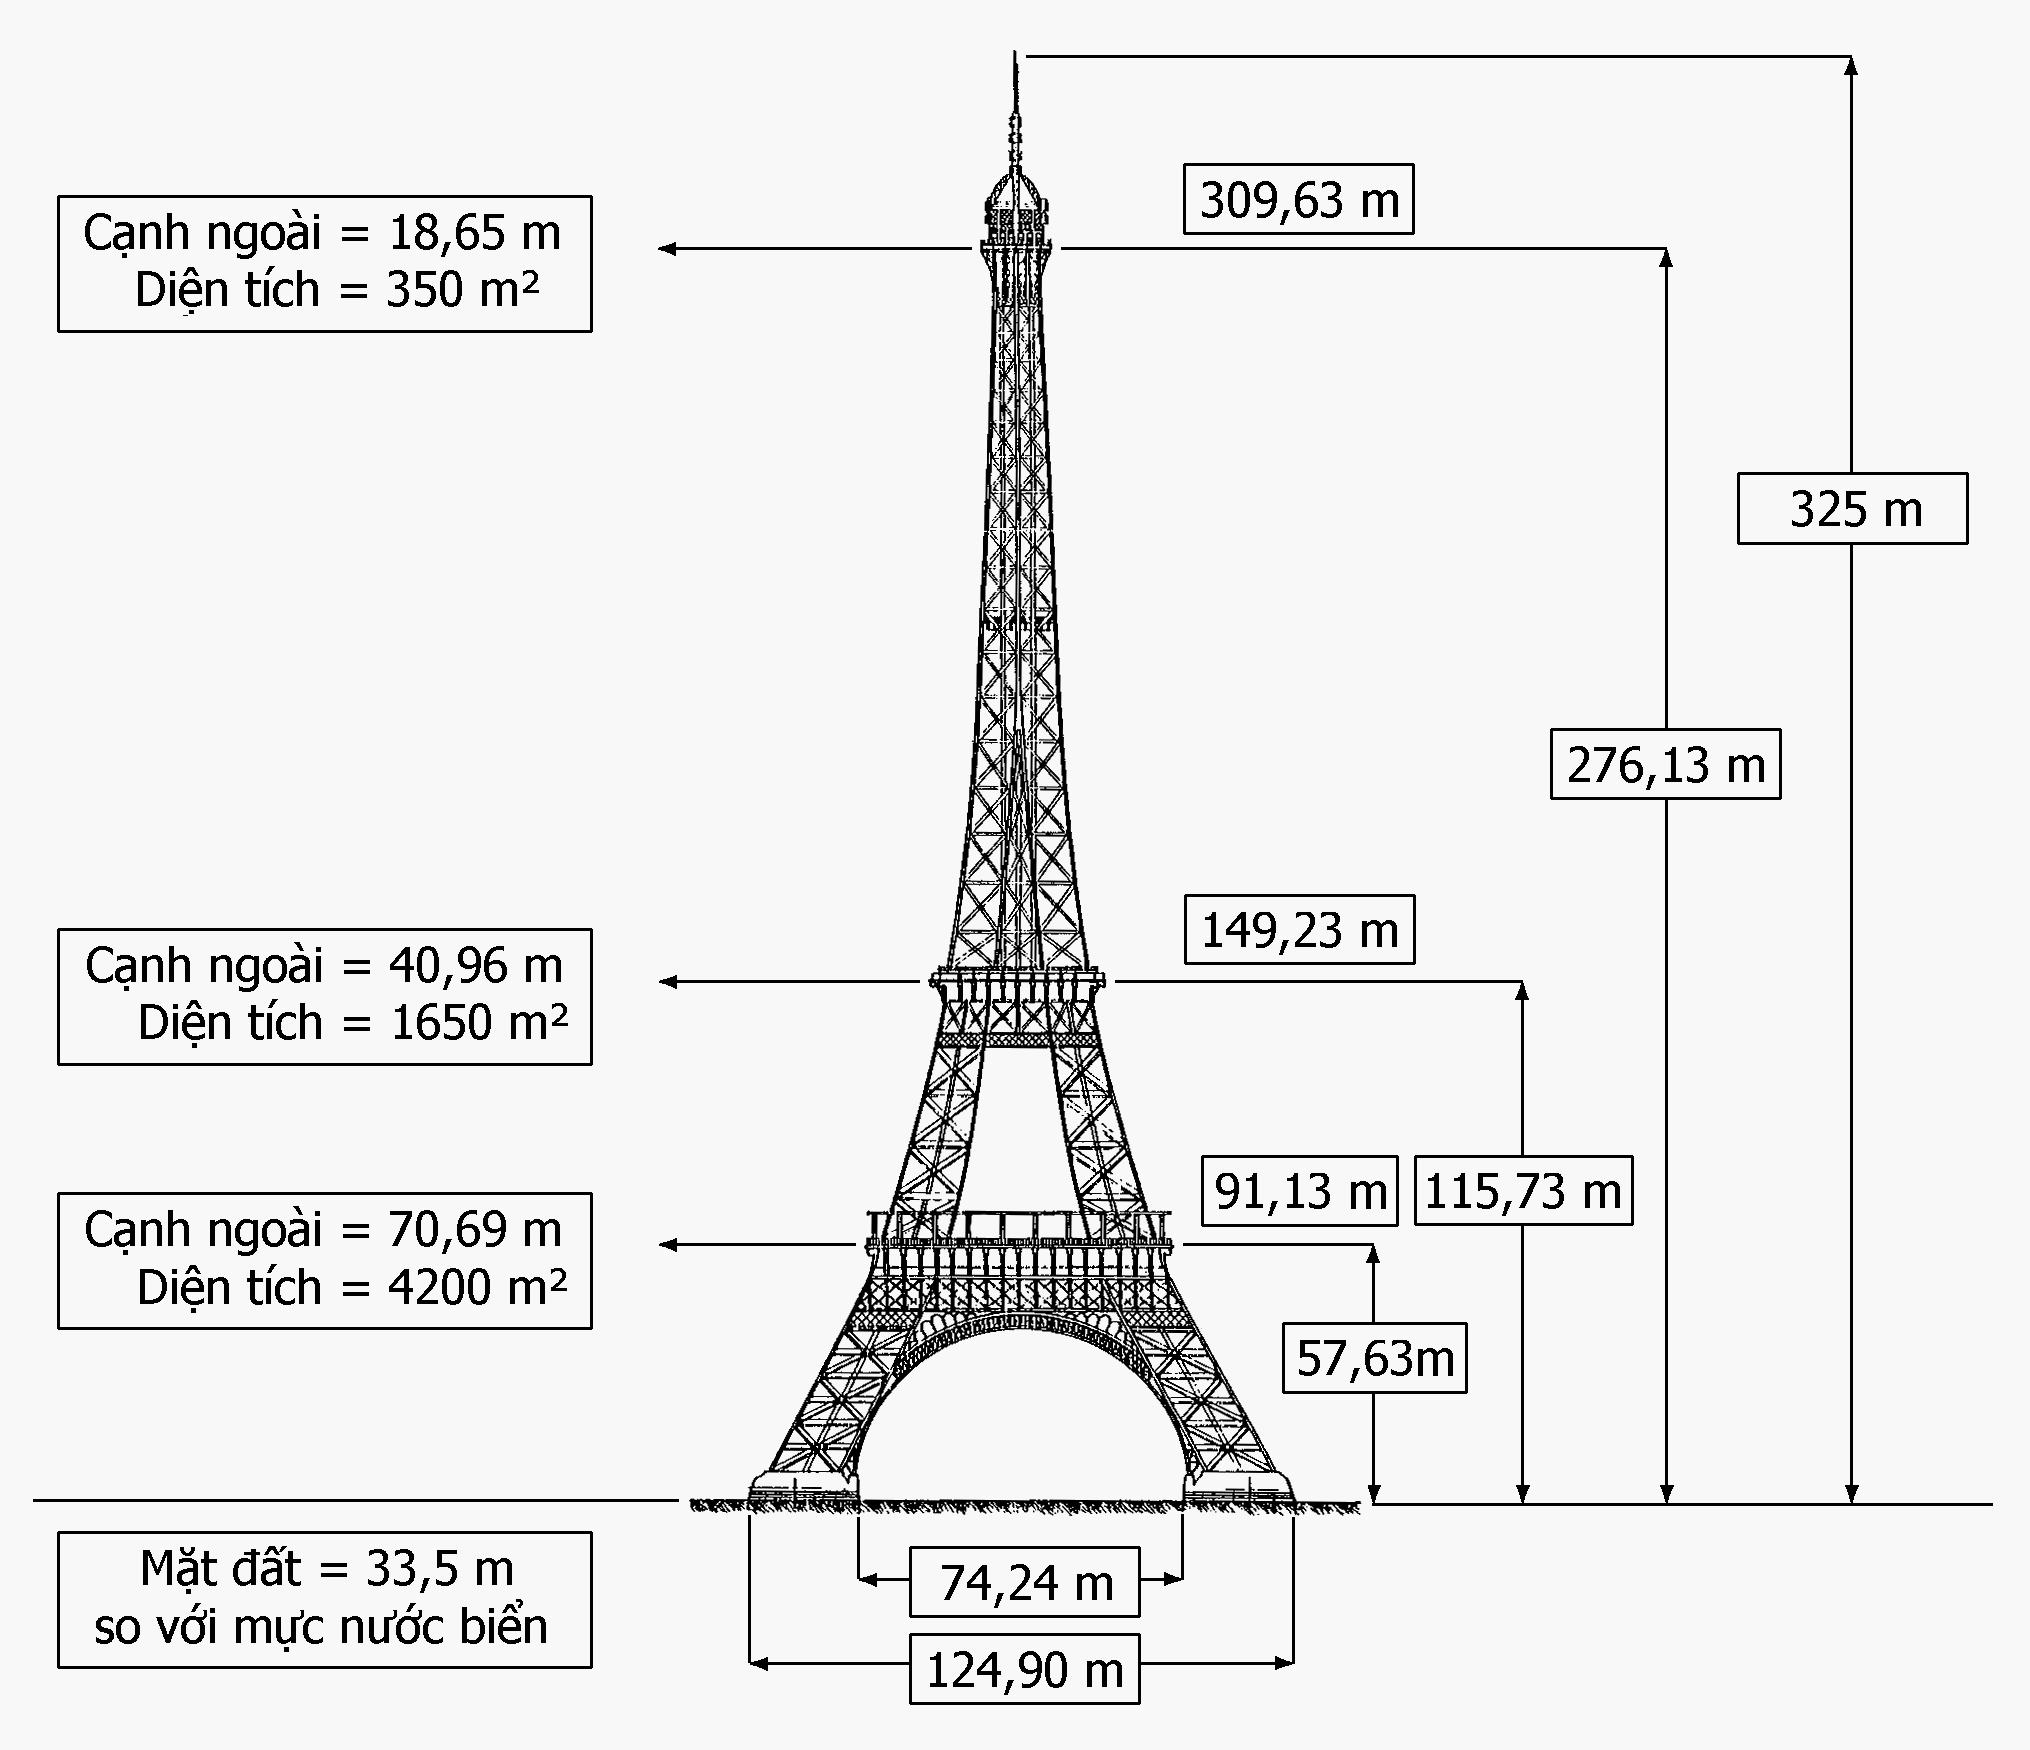 Tháp Eiffel của Pháp